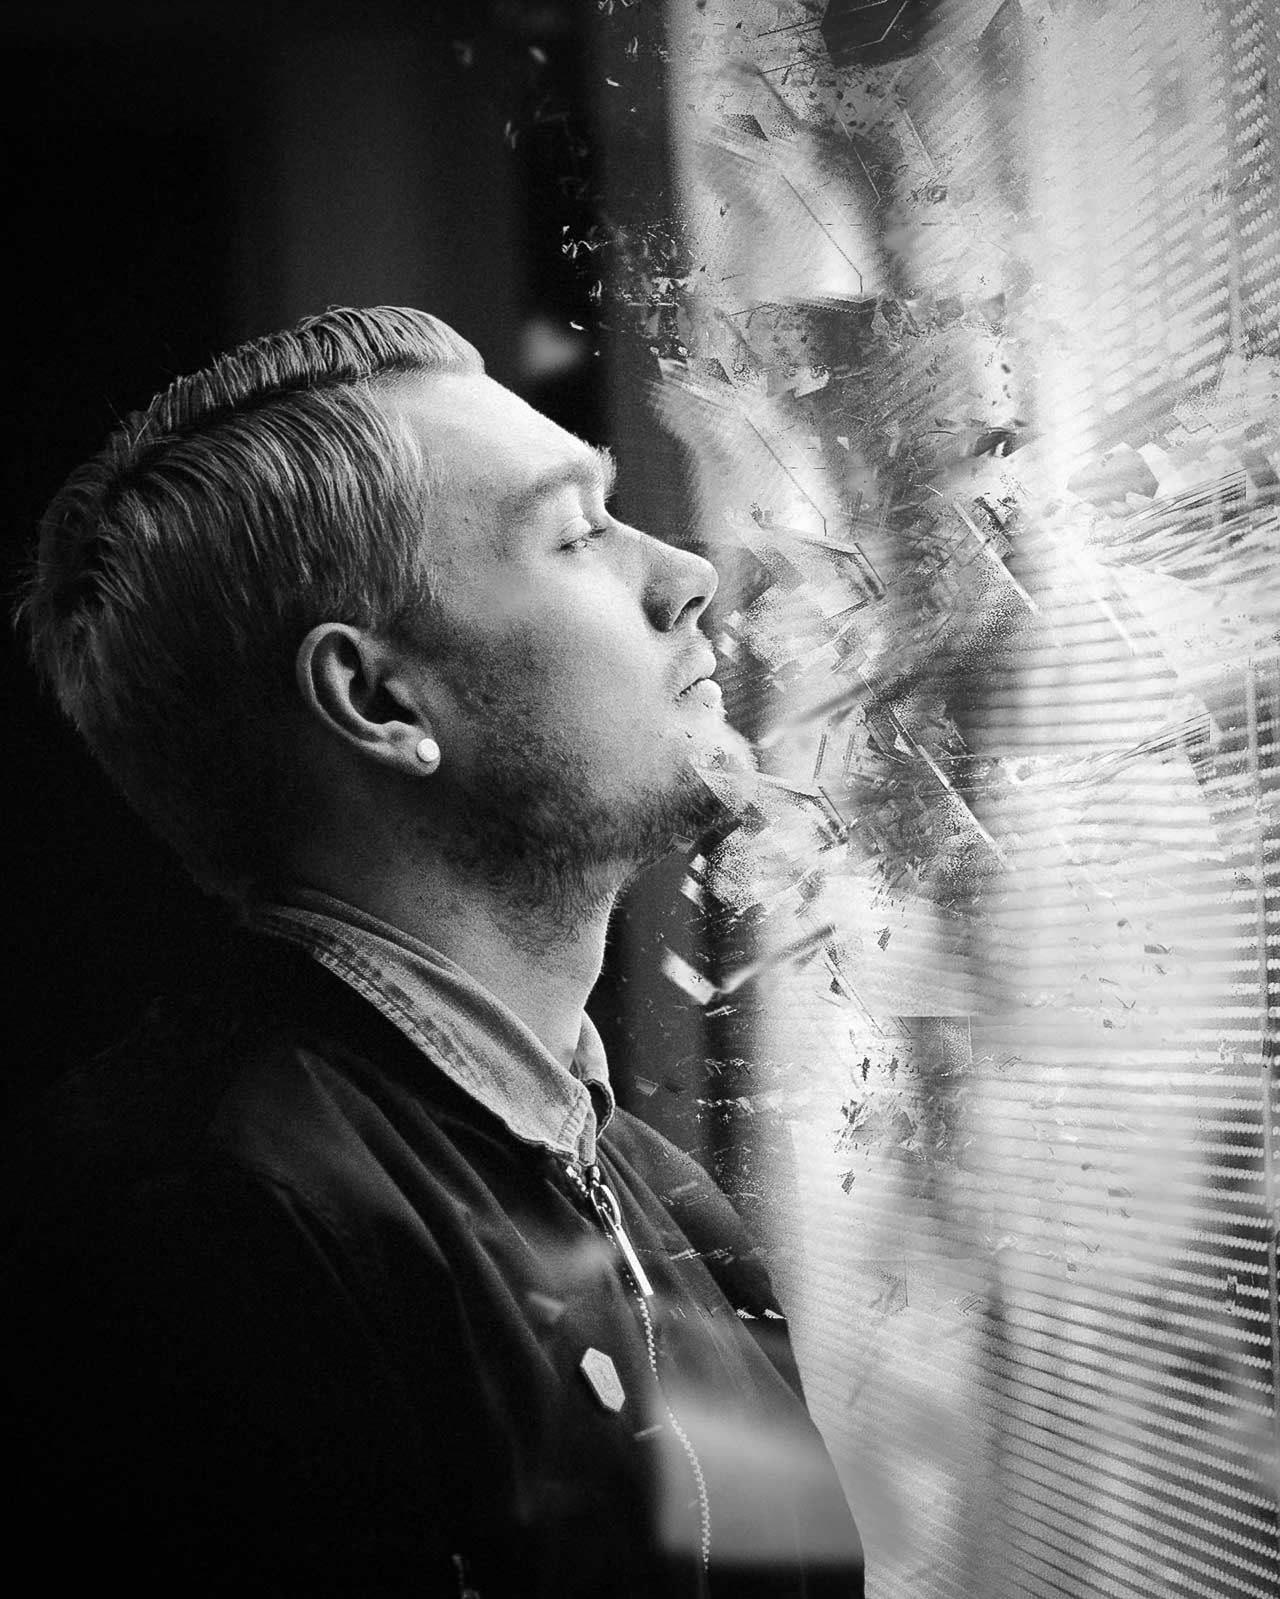 freelance fotografer i hele Østjylland